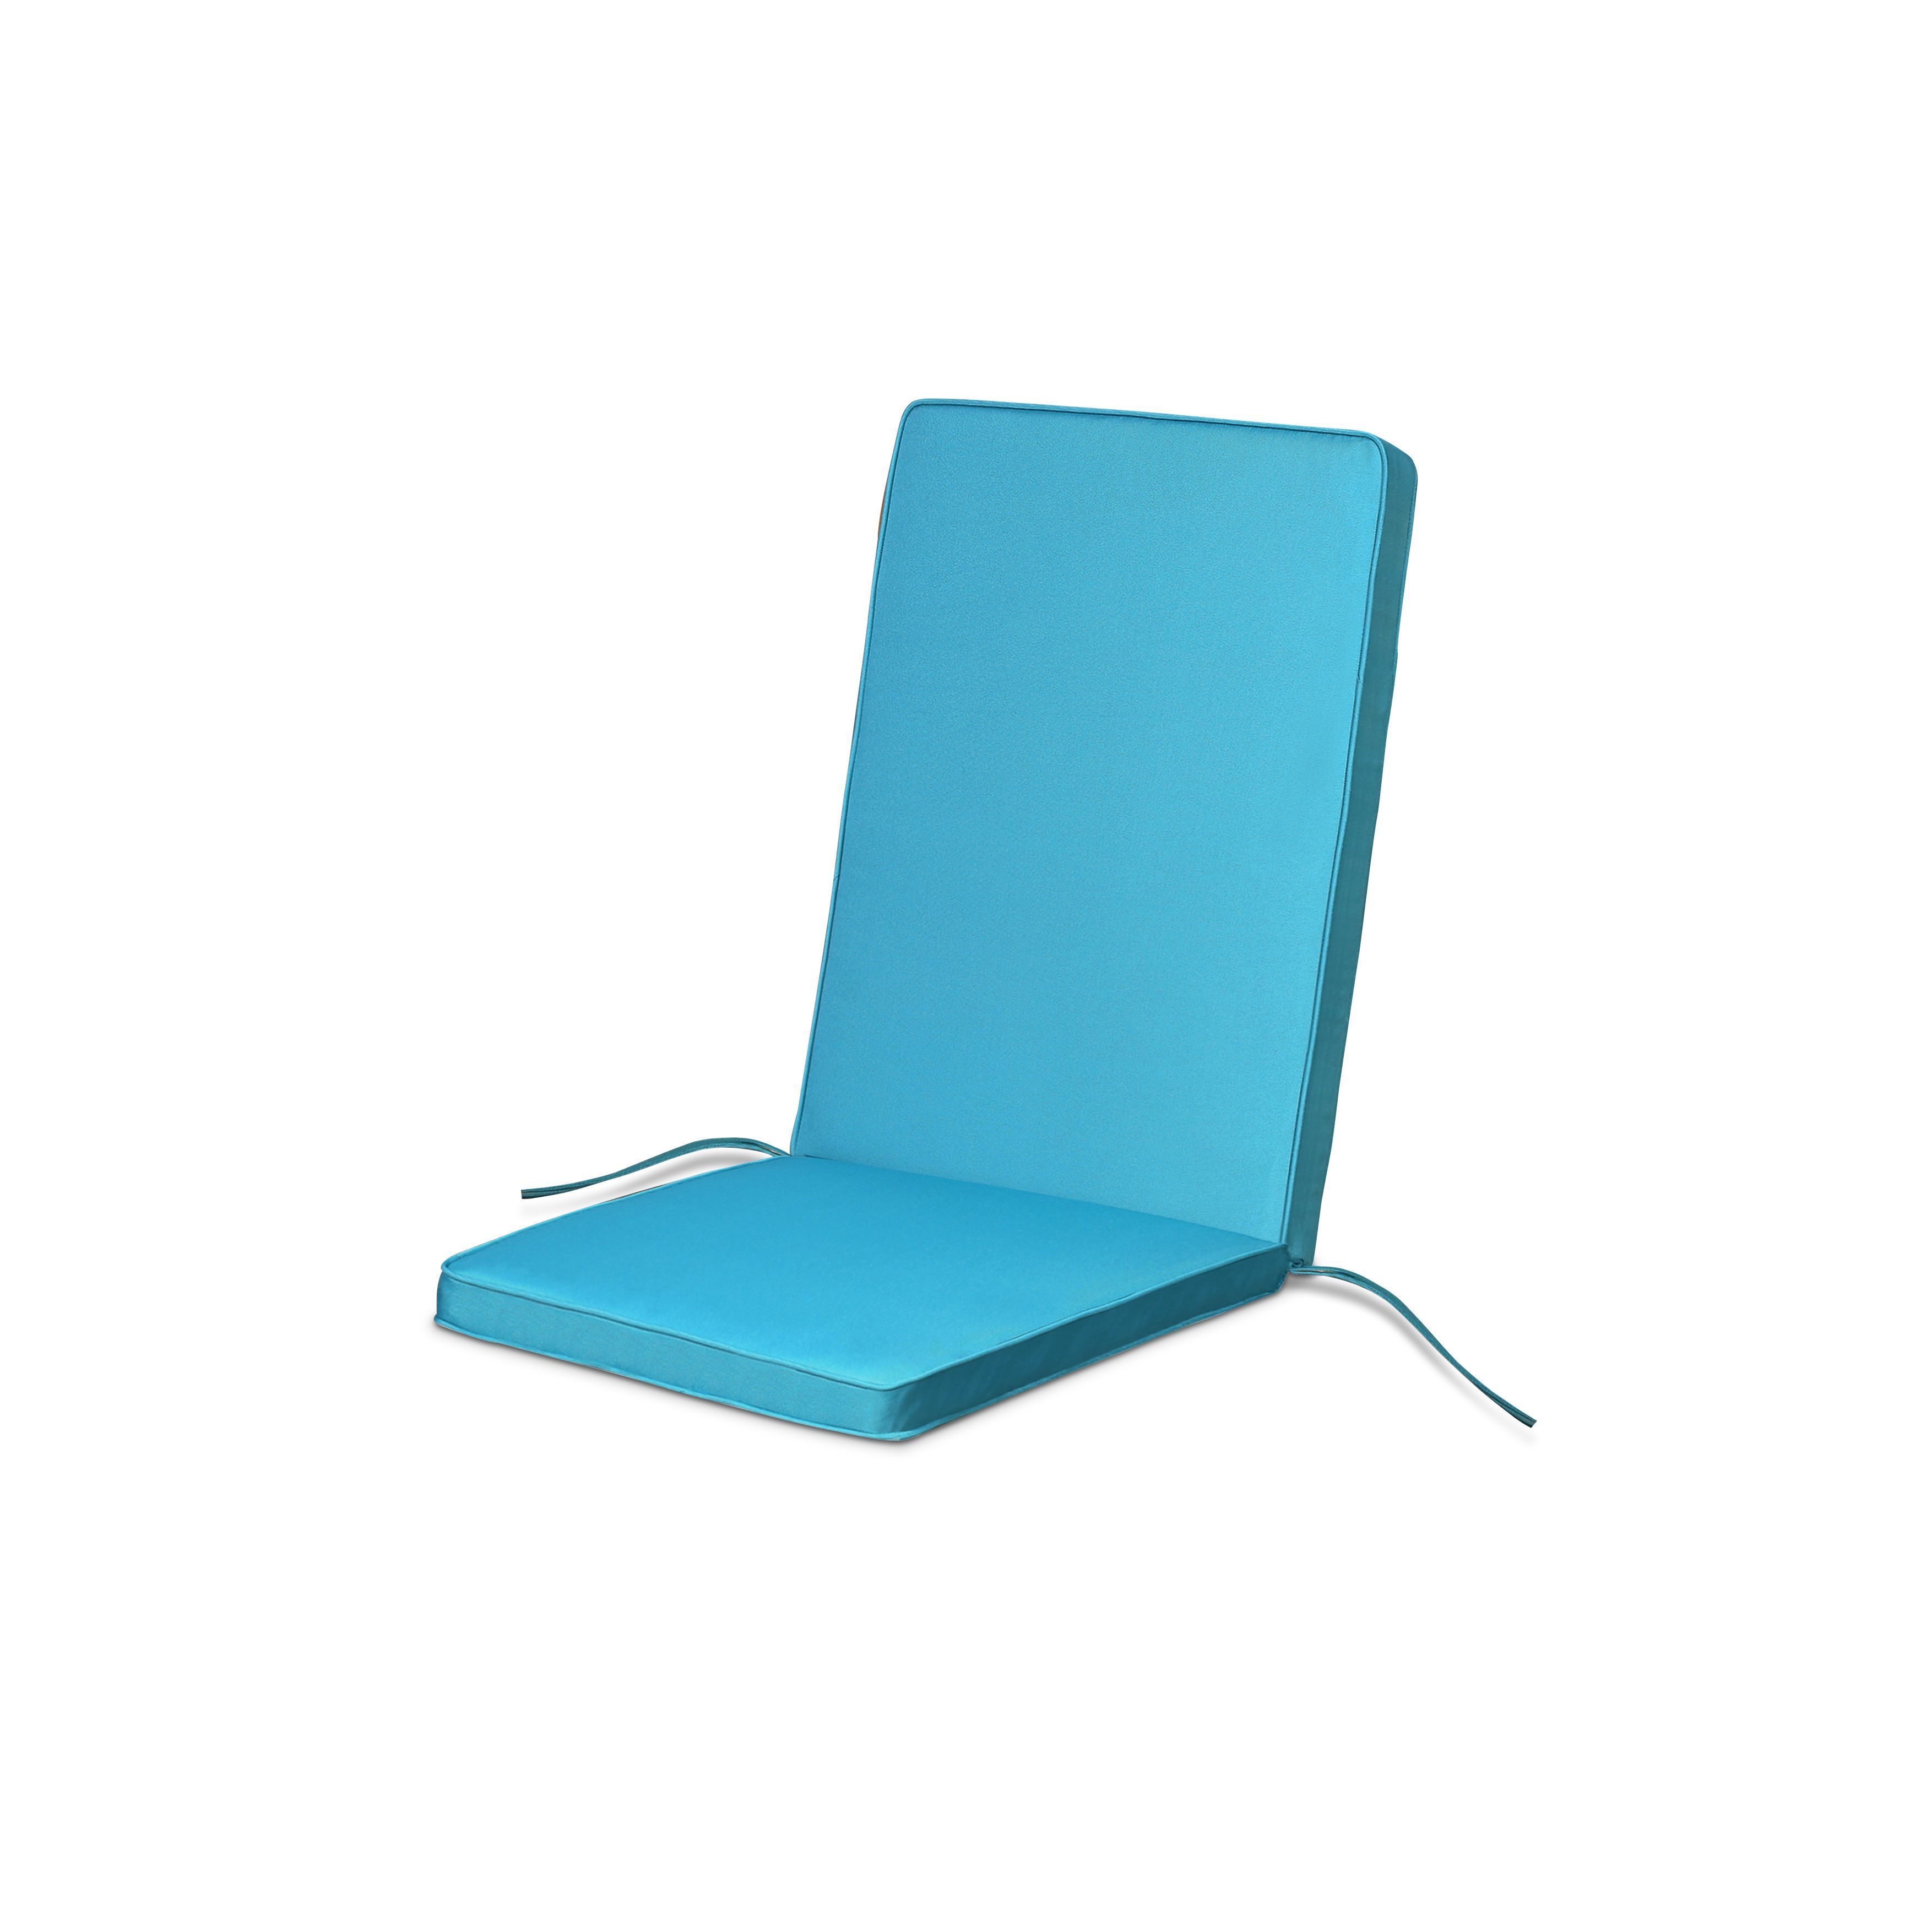 Tiga Biscay Blue Plain High Back Seat Cushion